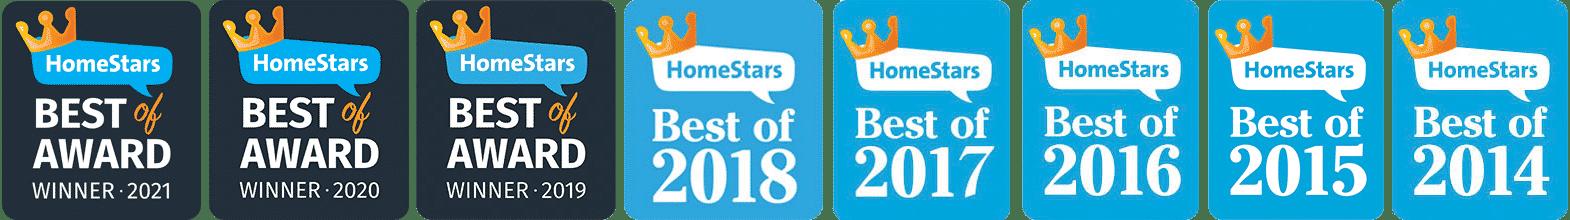 Toronto HomeStars Award Winning Contractor